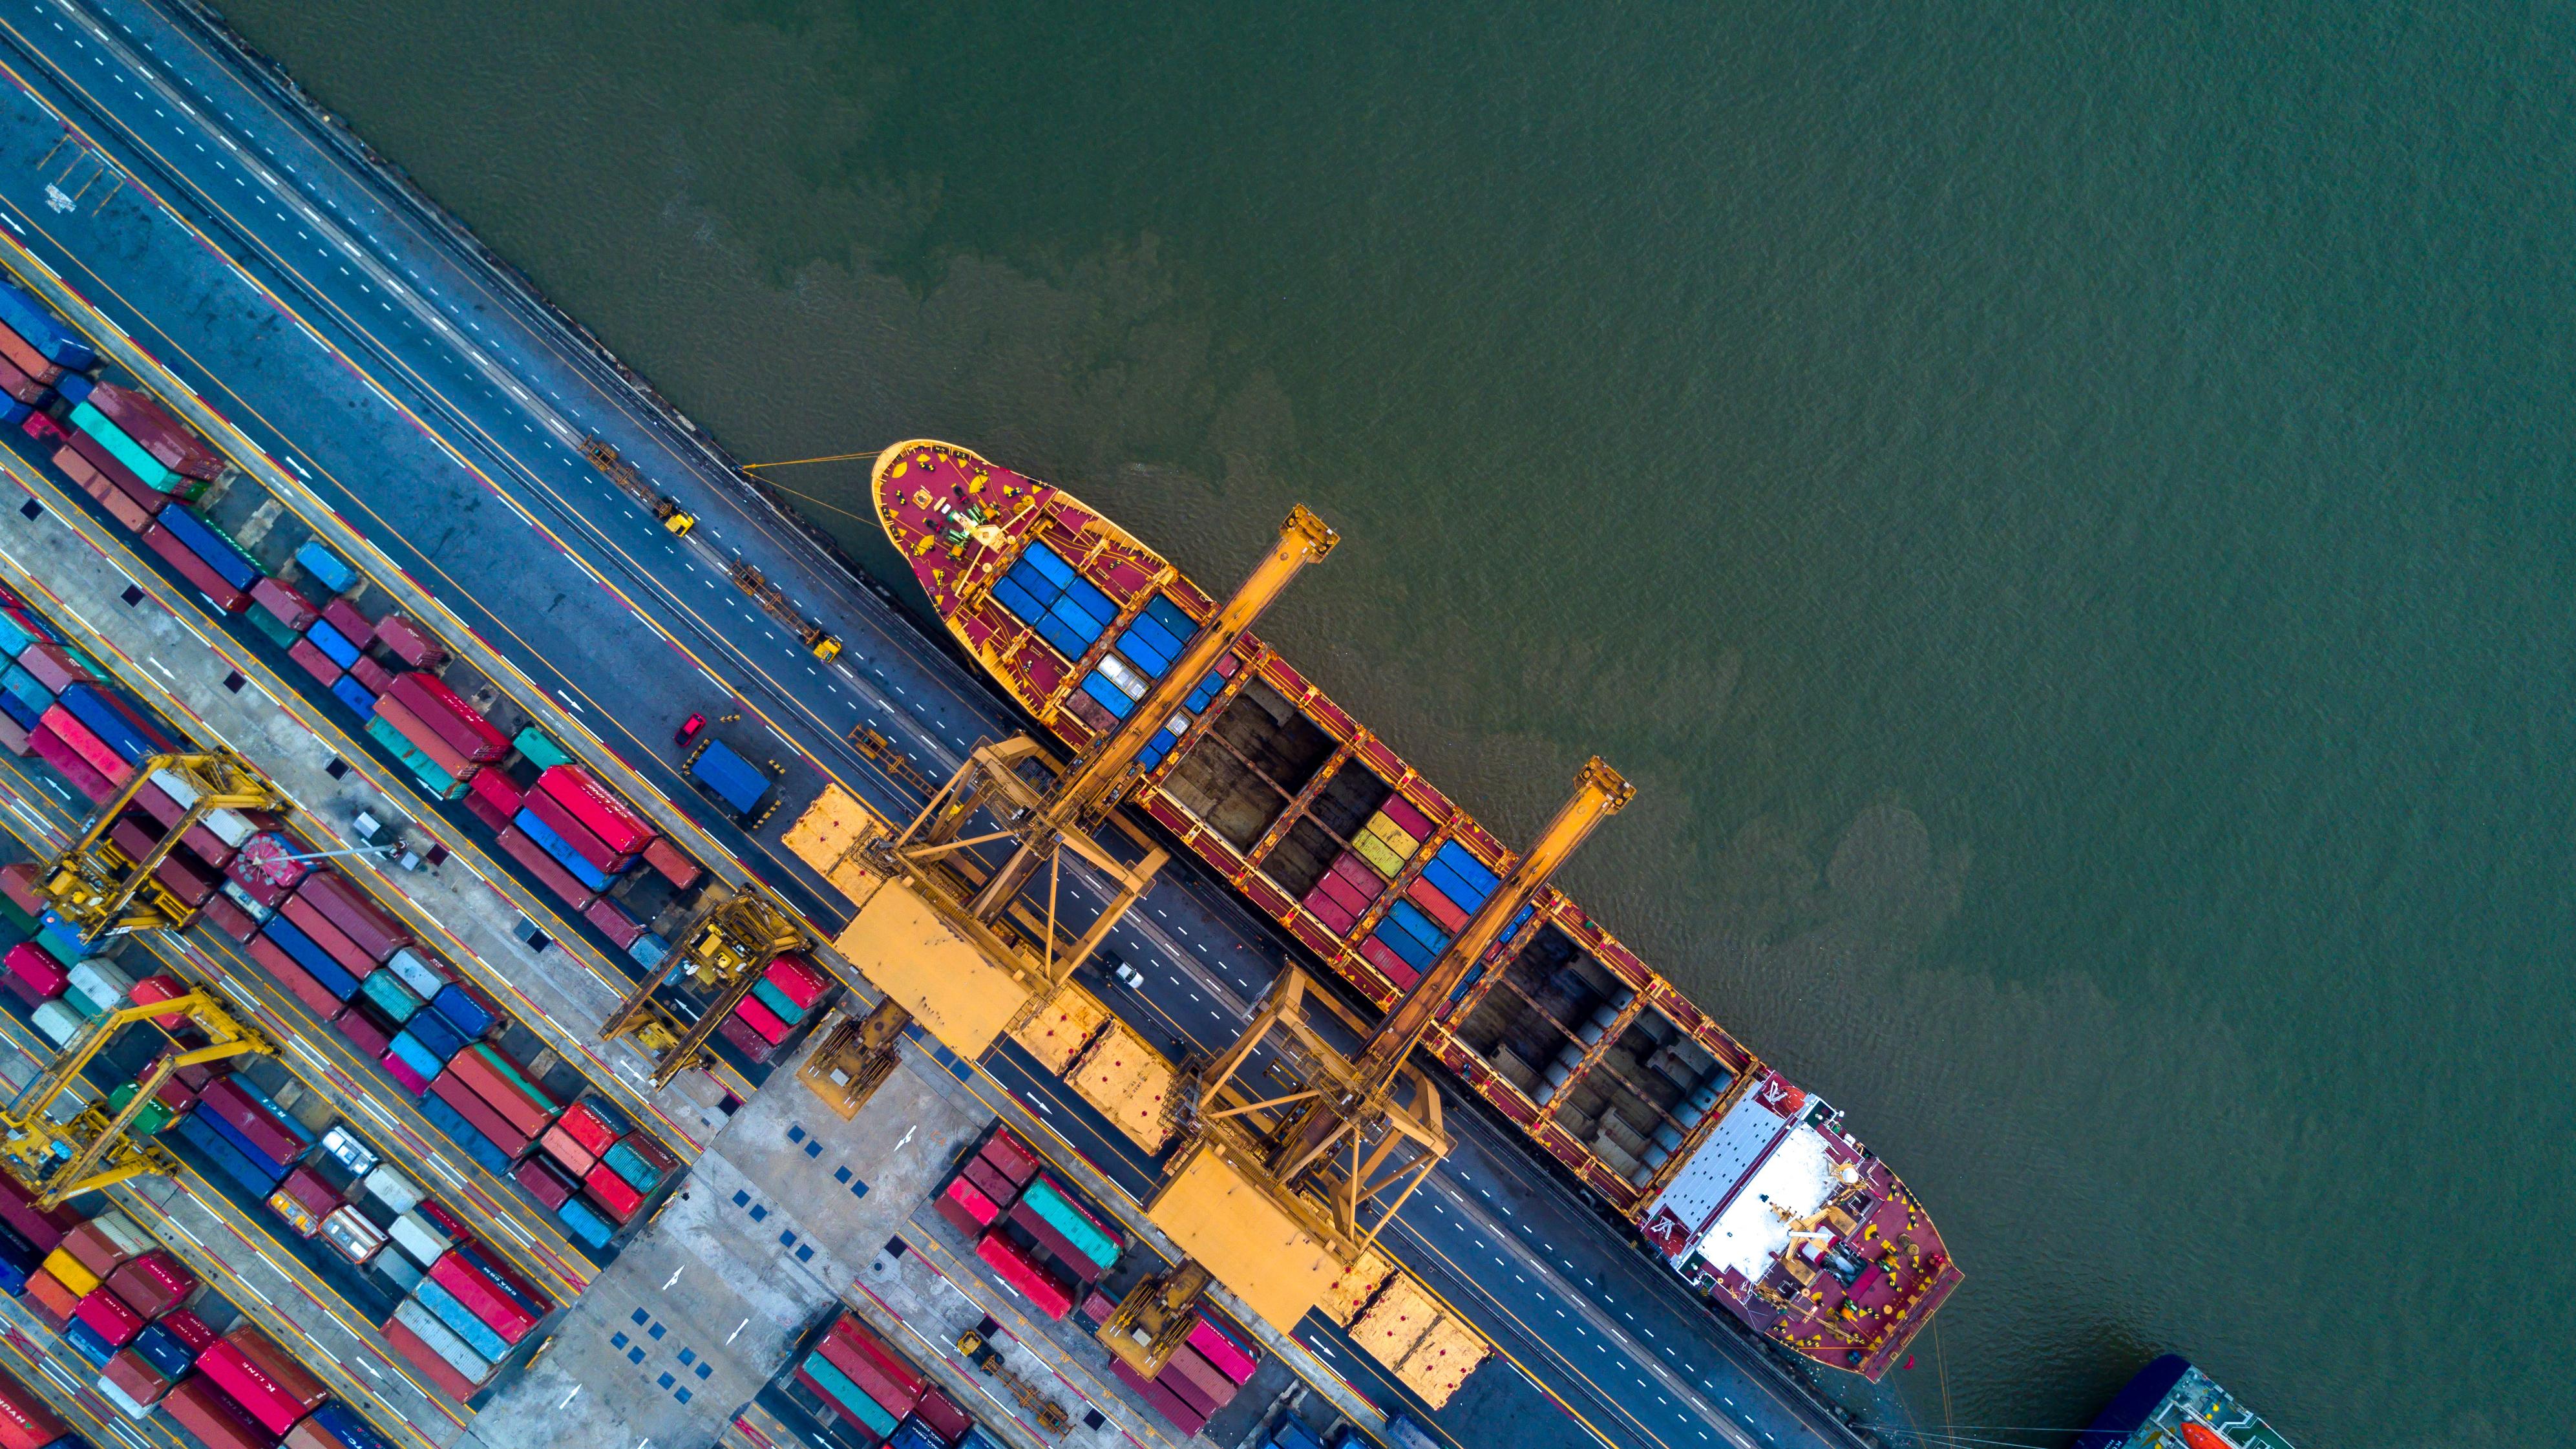 scheepvaart-maritiem-logistiek-logistics-offshore-innovatie-consult-consultant-consultants-advies-adviseur-adviseurs-vellianen